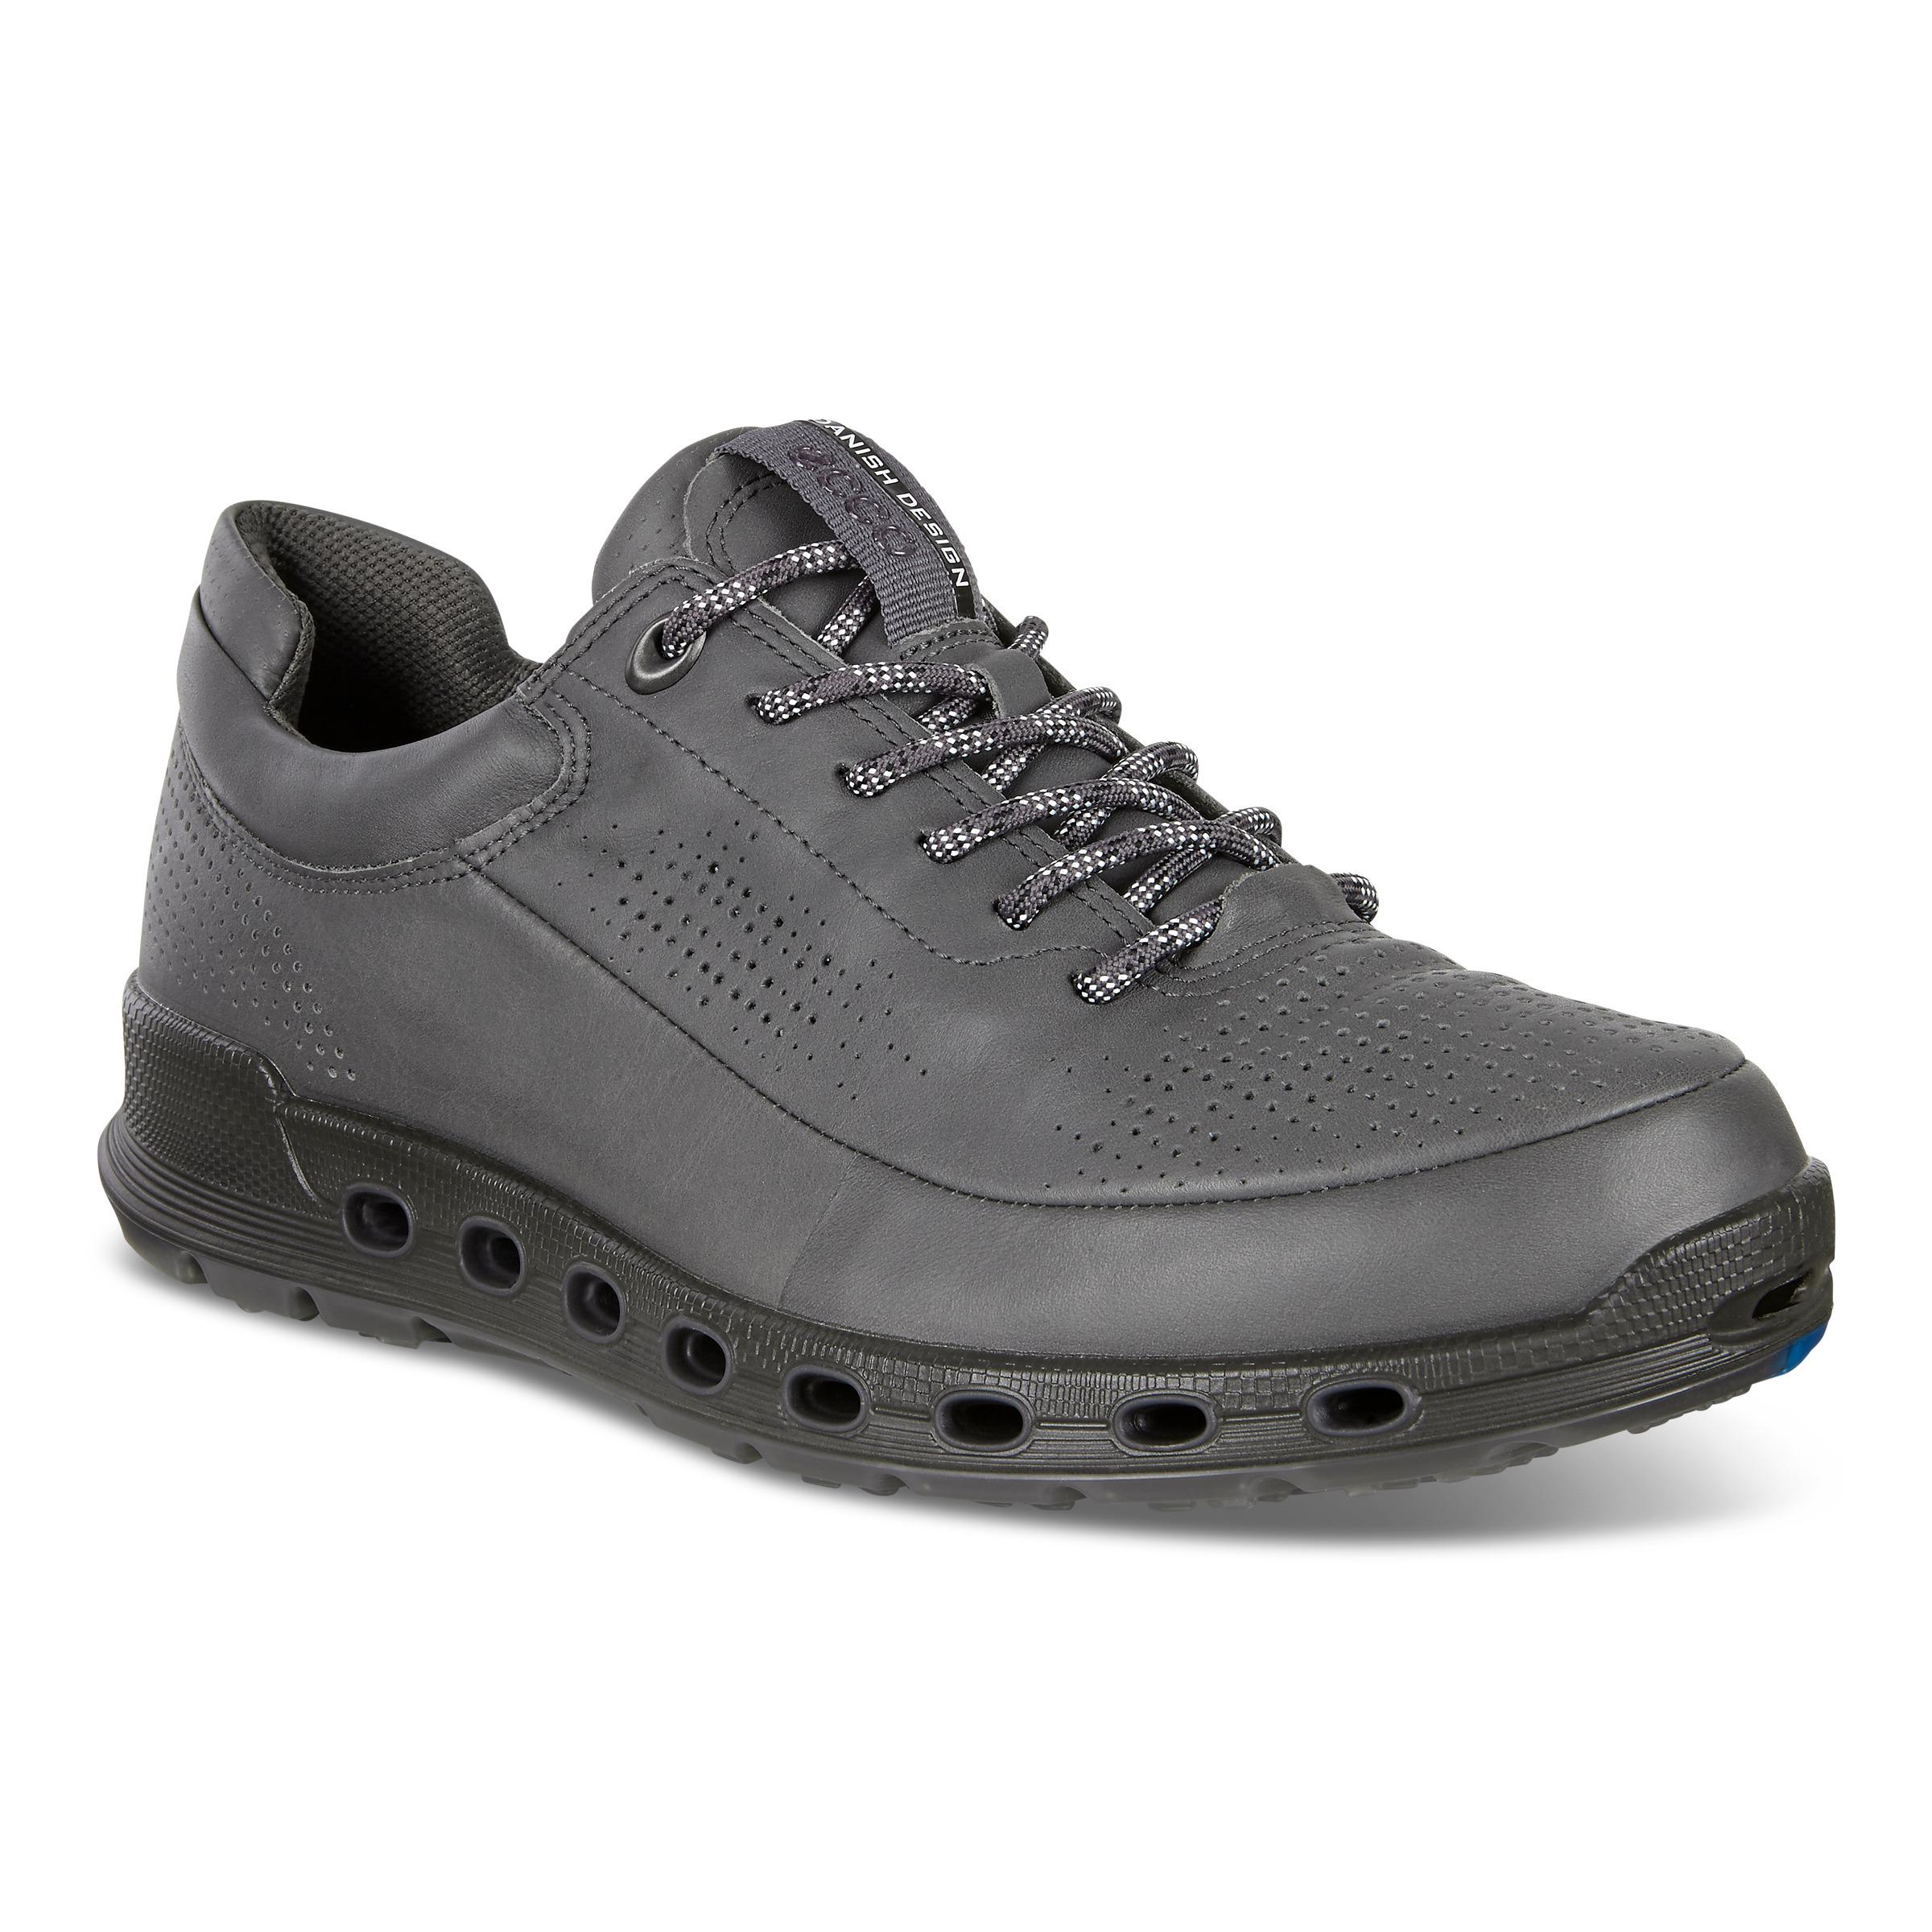 Walking - COOL 2.0 MENS - ECCO Shoes NZ